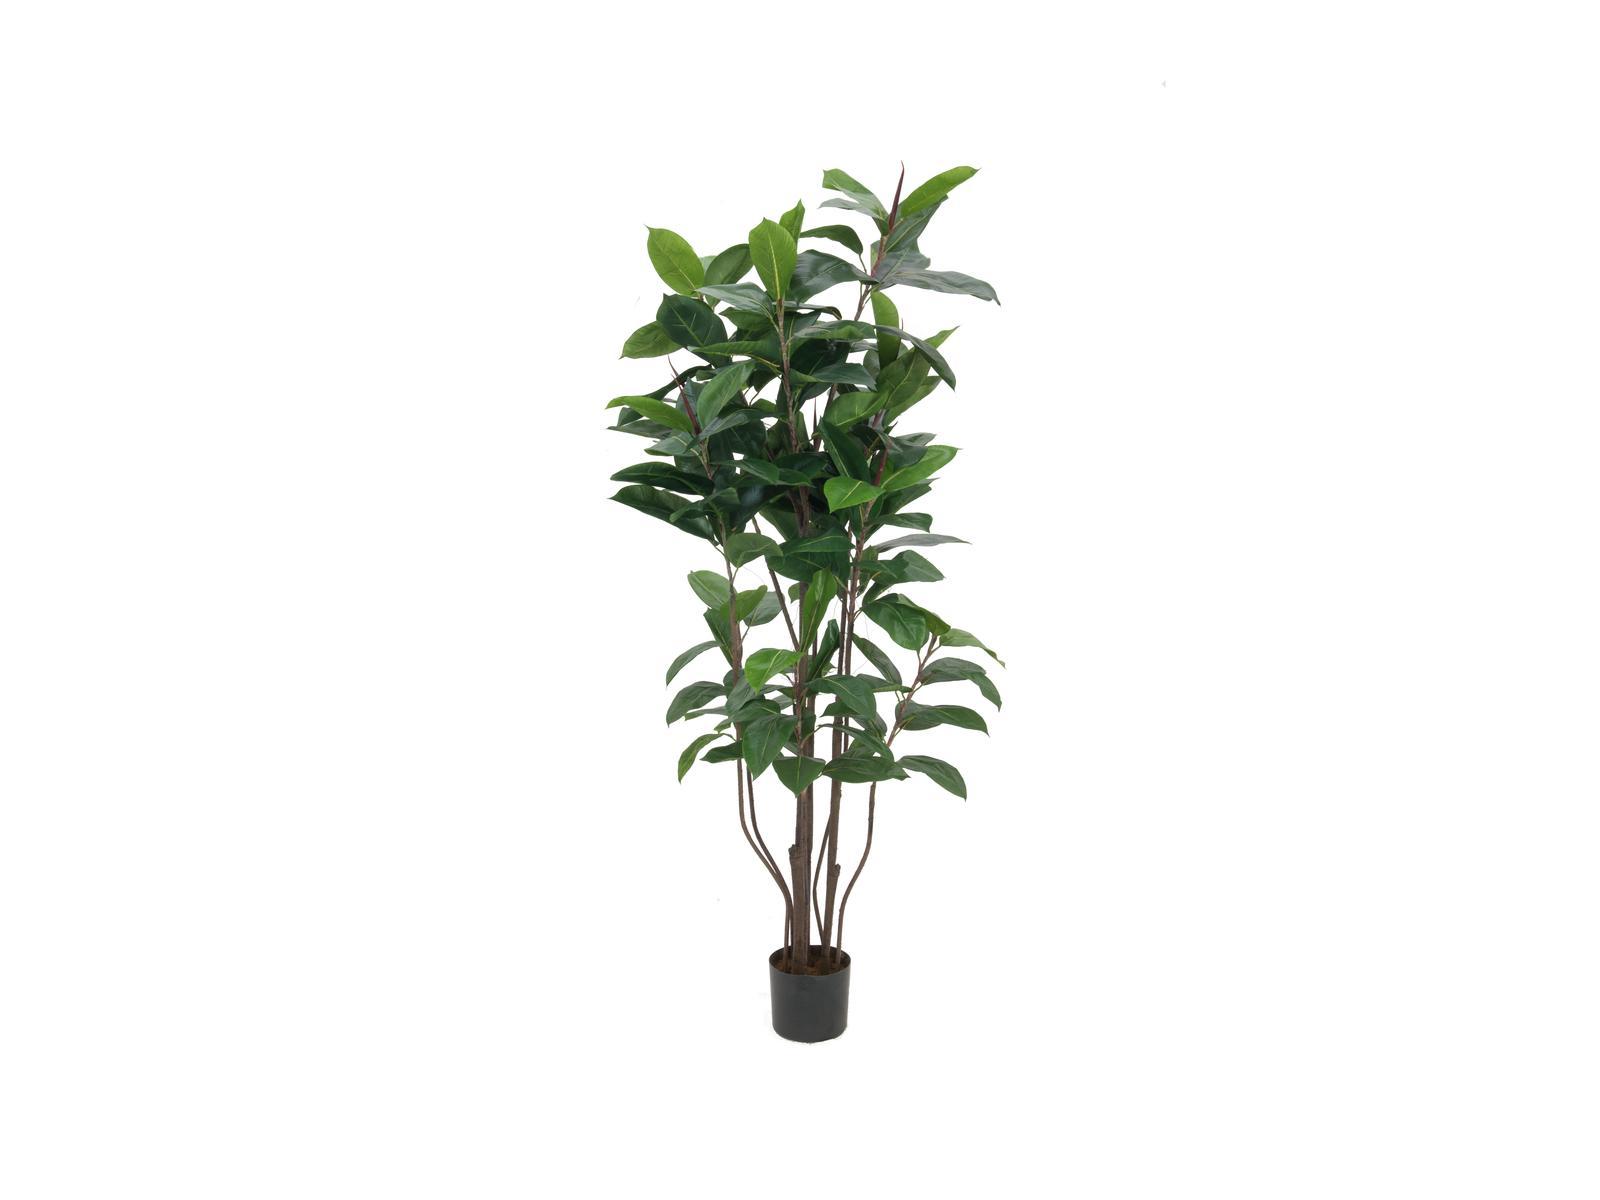 europalms-gummibaum-150cm-kunststoffpflanze